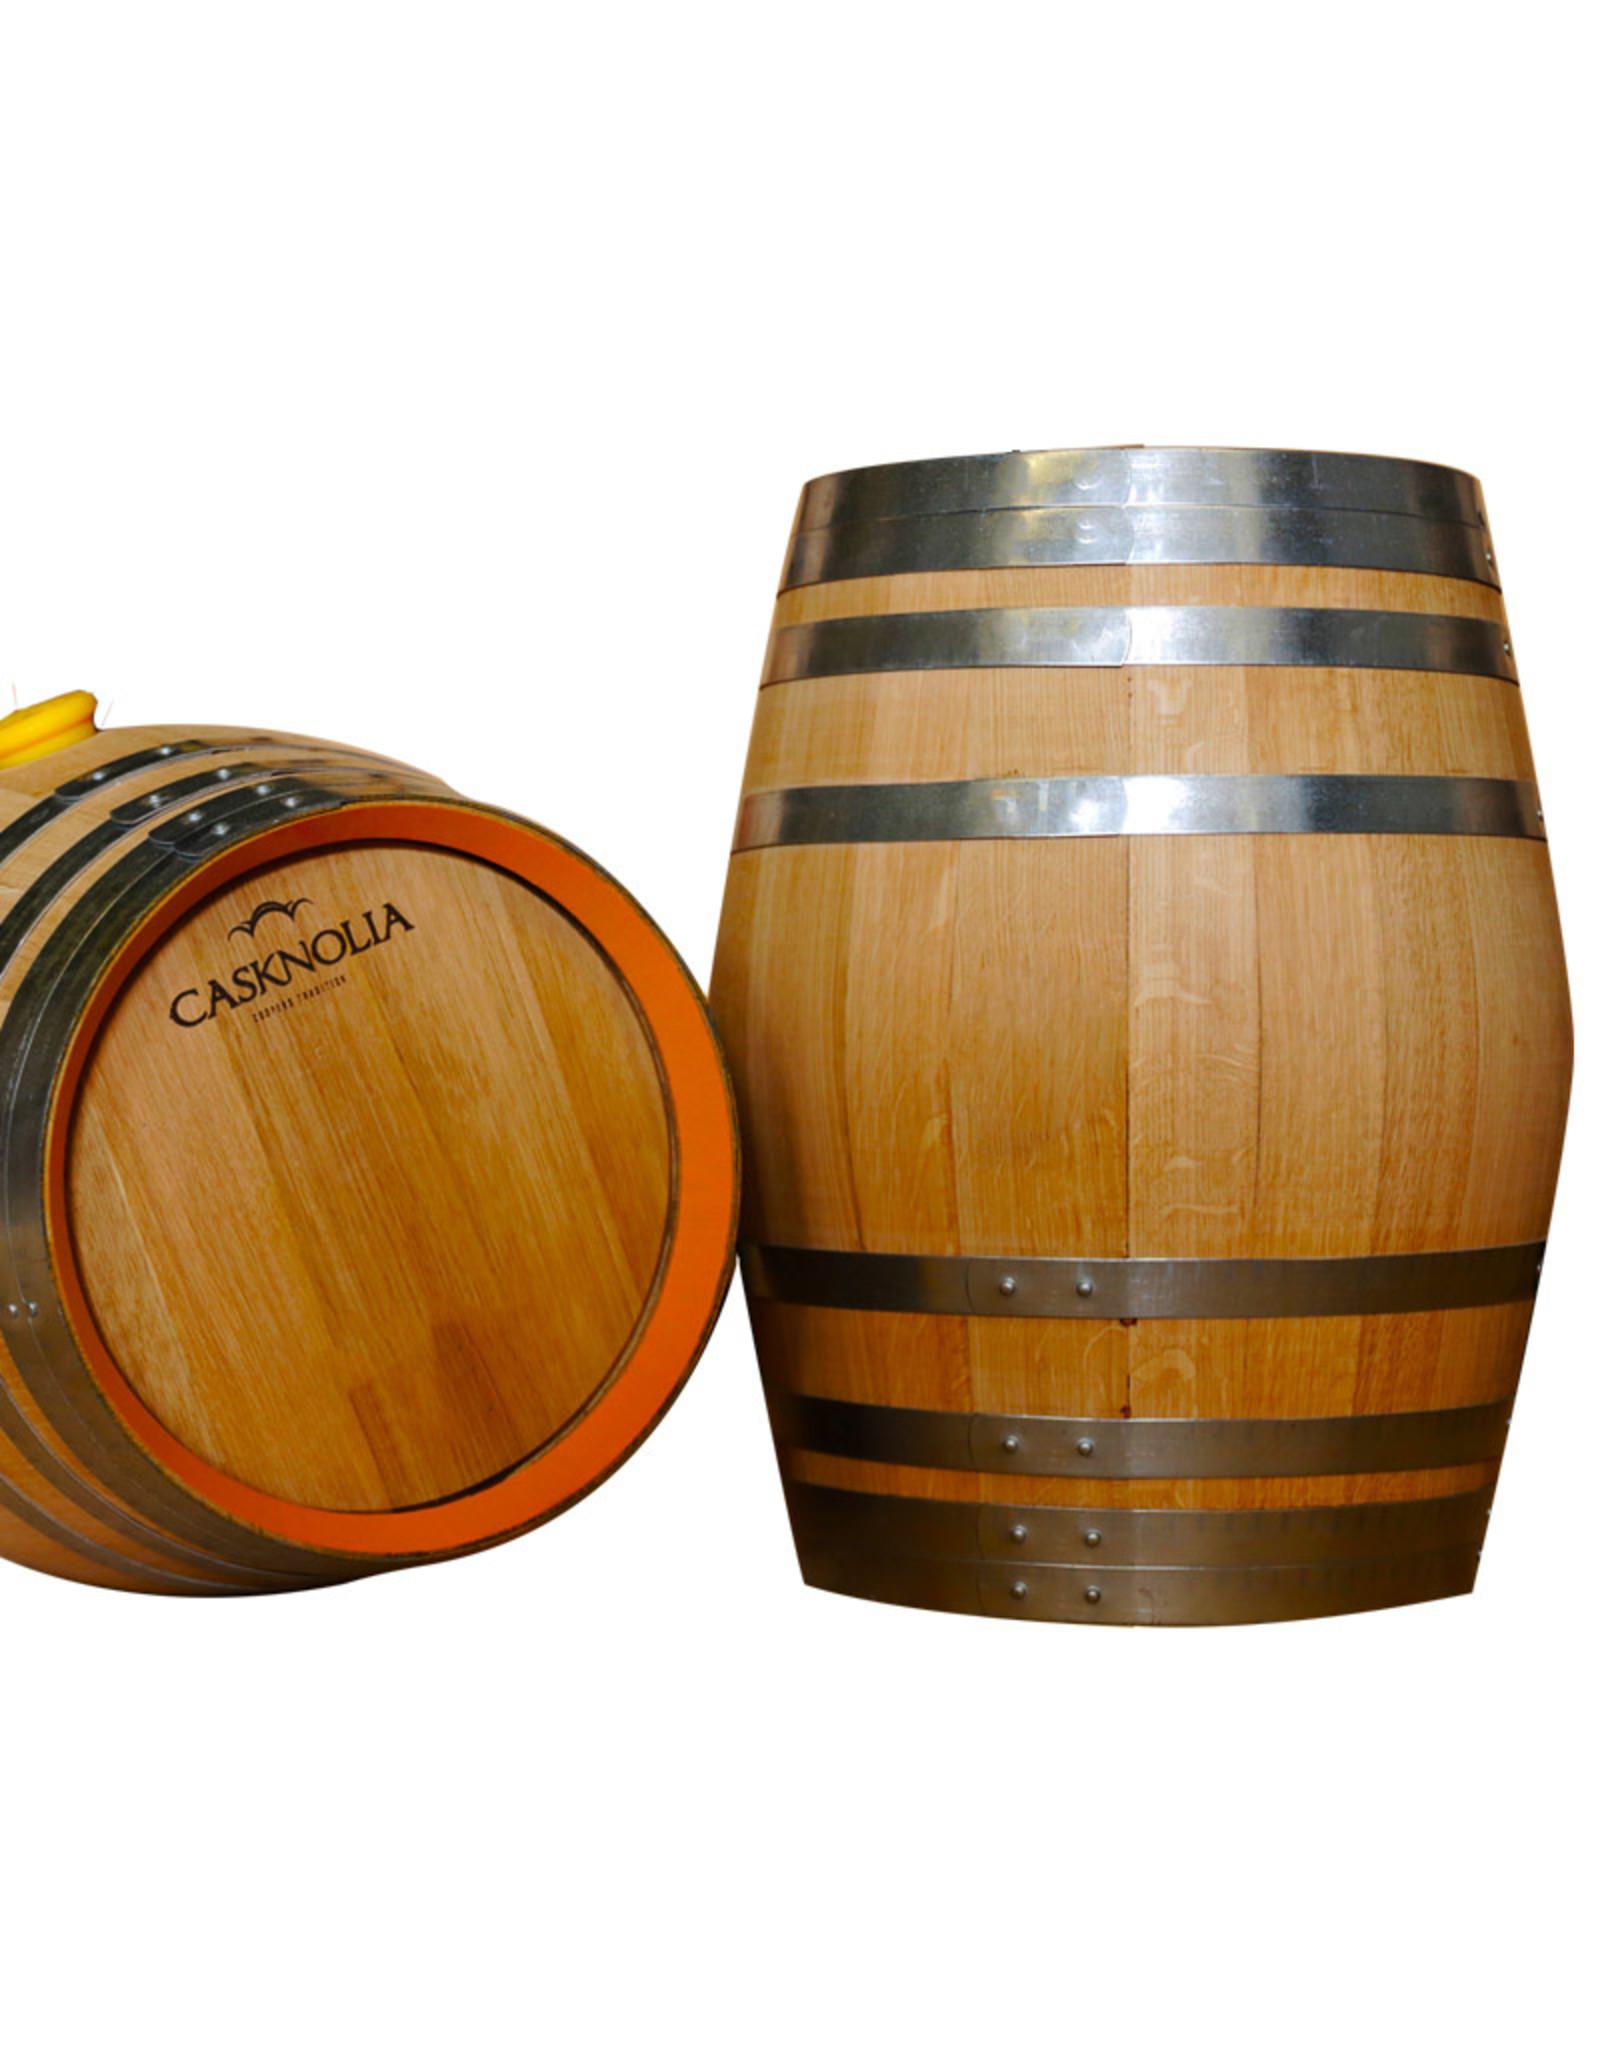 30 L - 500 L CASKNOLIA® SPIRIT BARREL SPANISH OAK